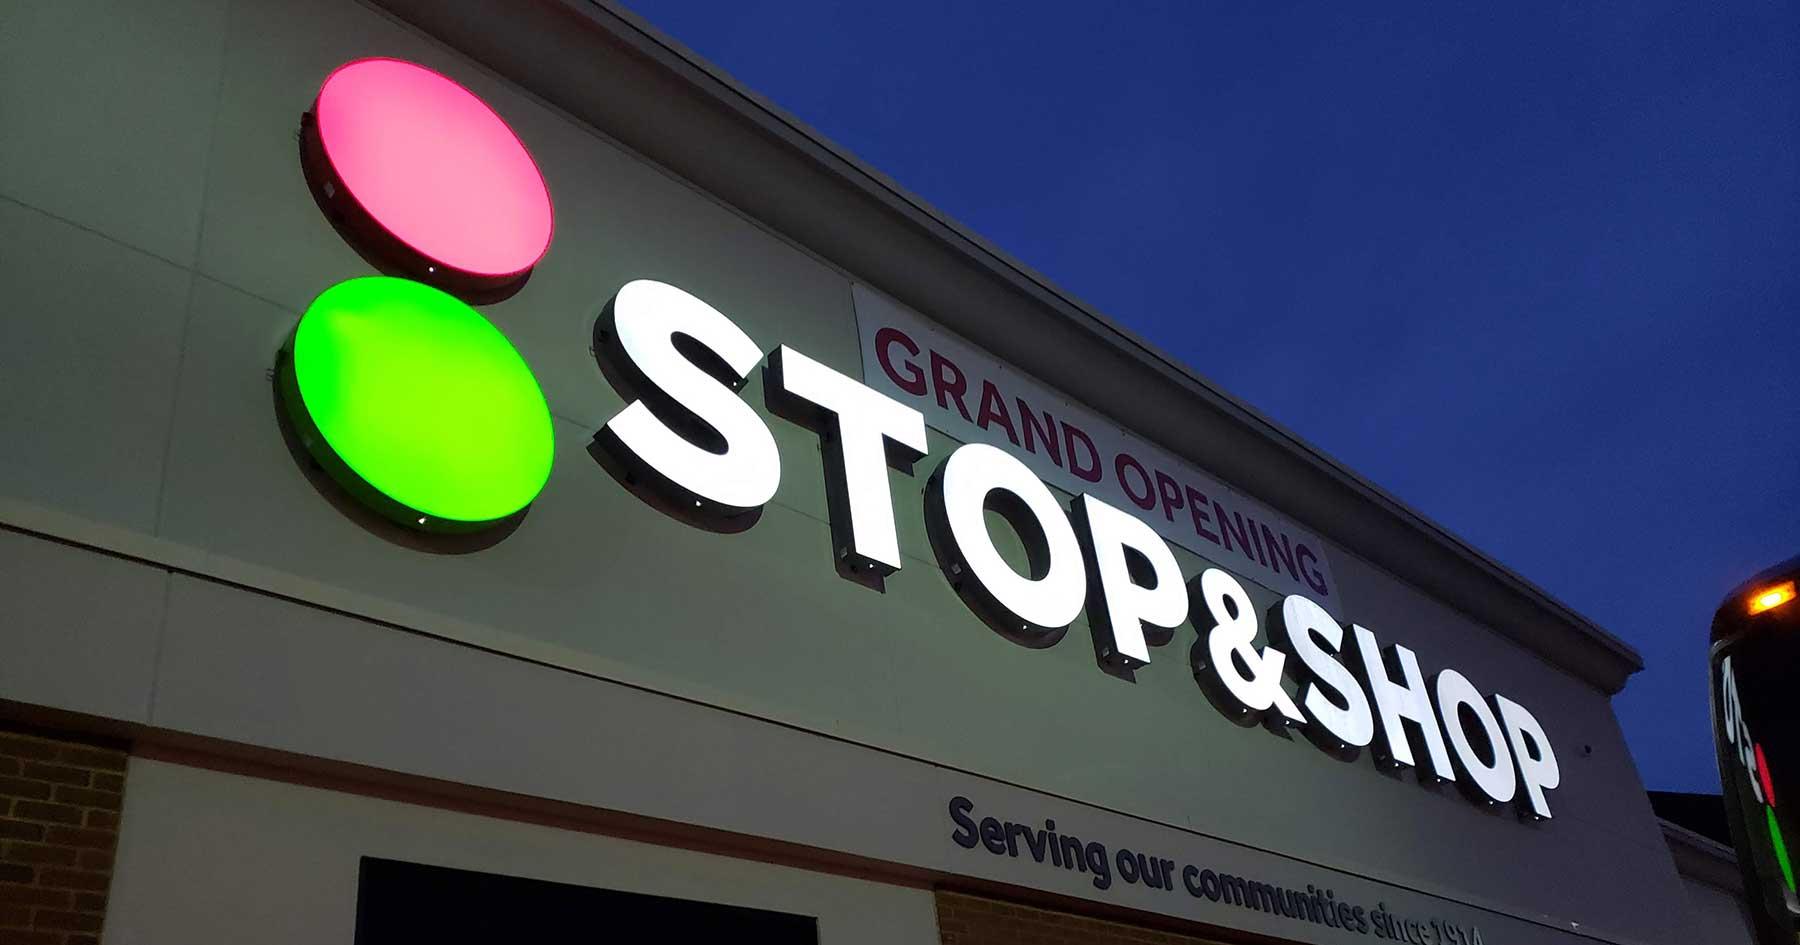 stop shop storefront